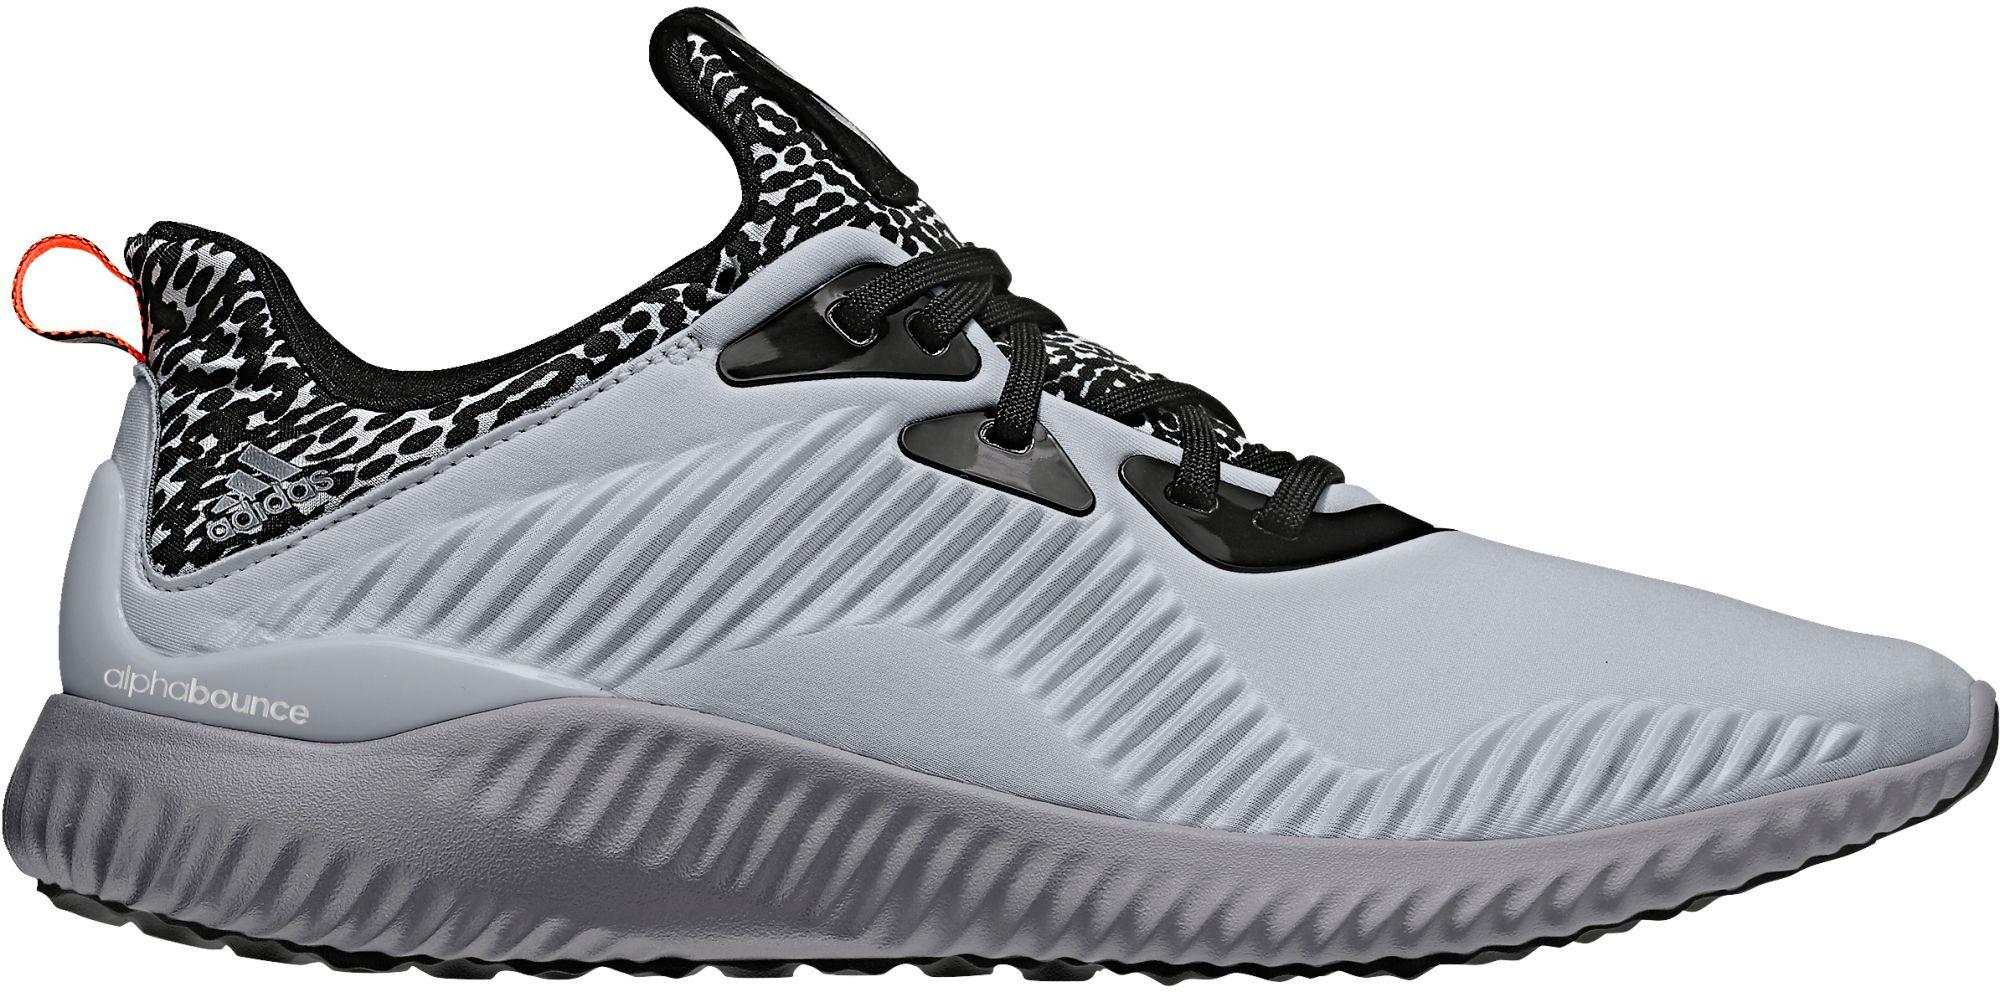 adidas Men's alphabounce Running Shoes